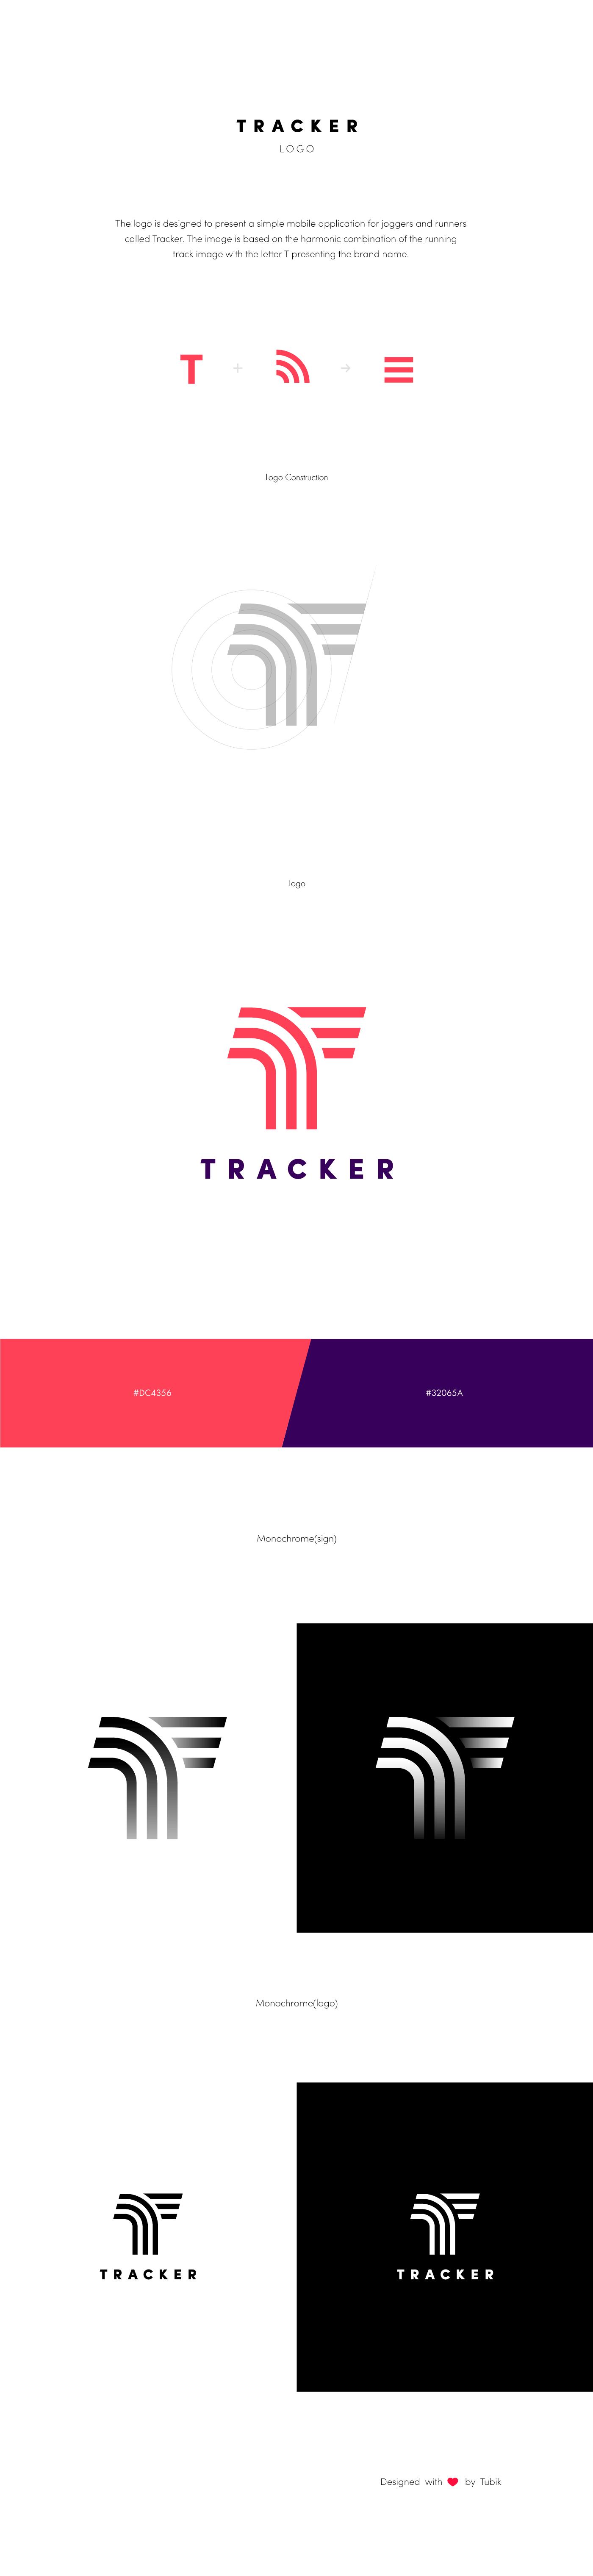 tracker logo presentation tubik